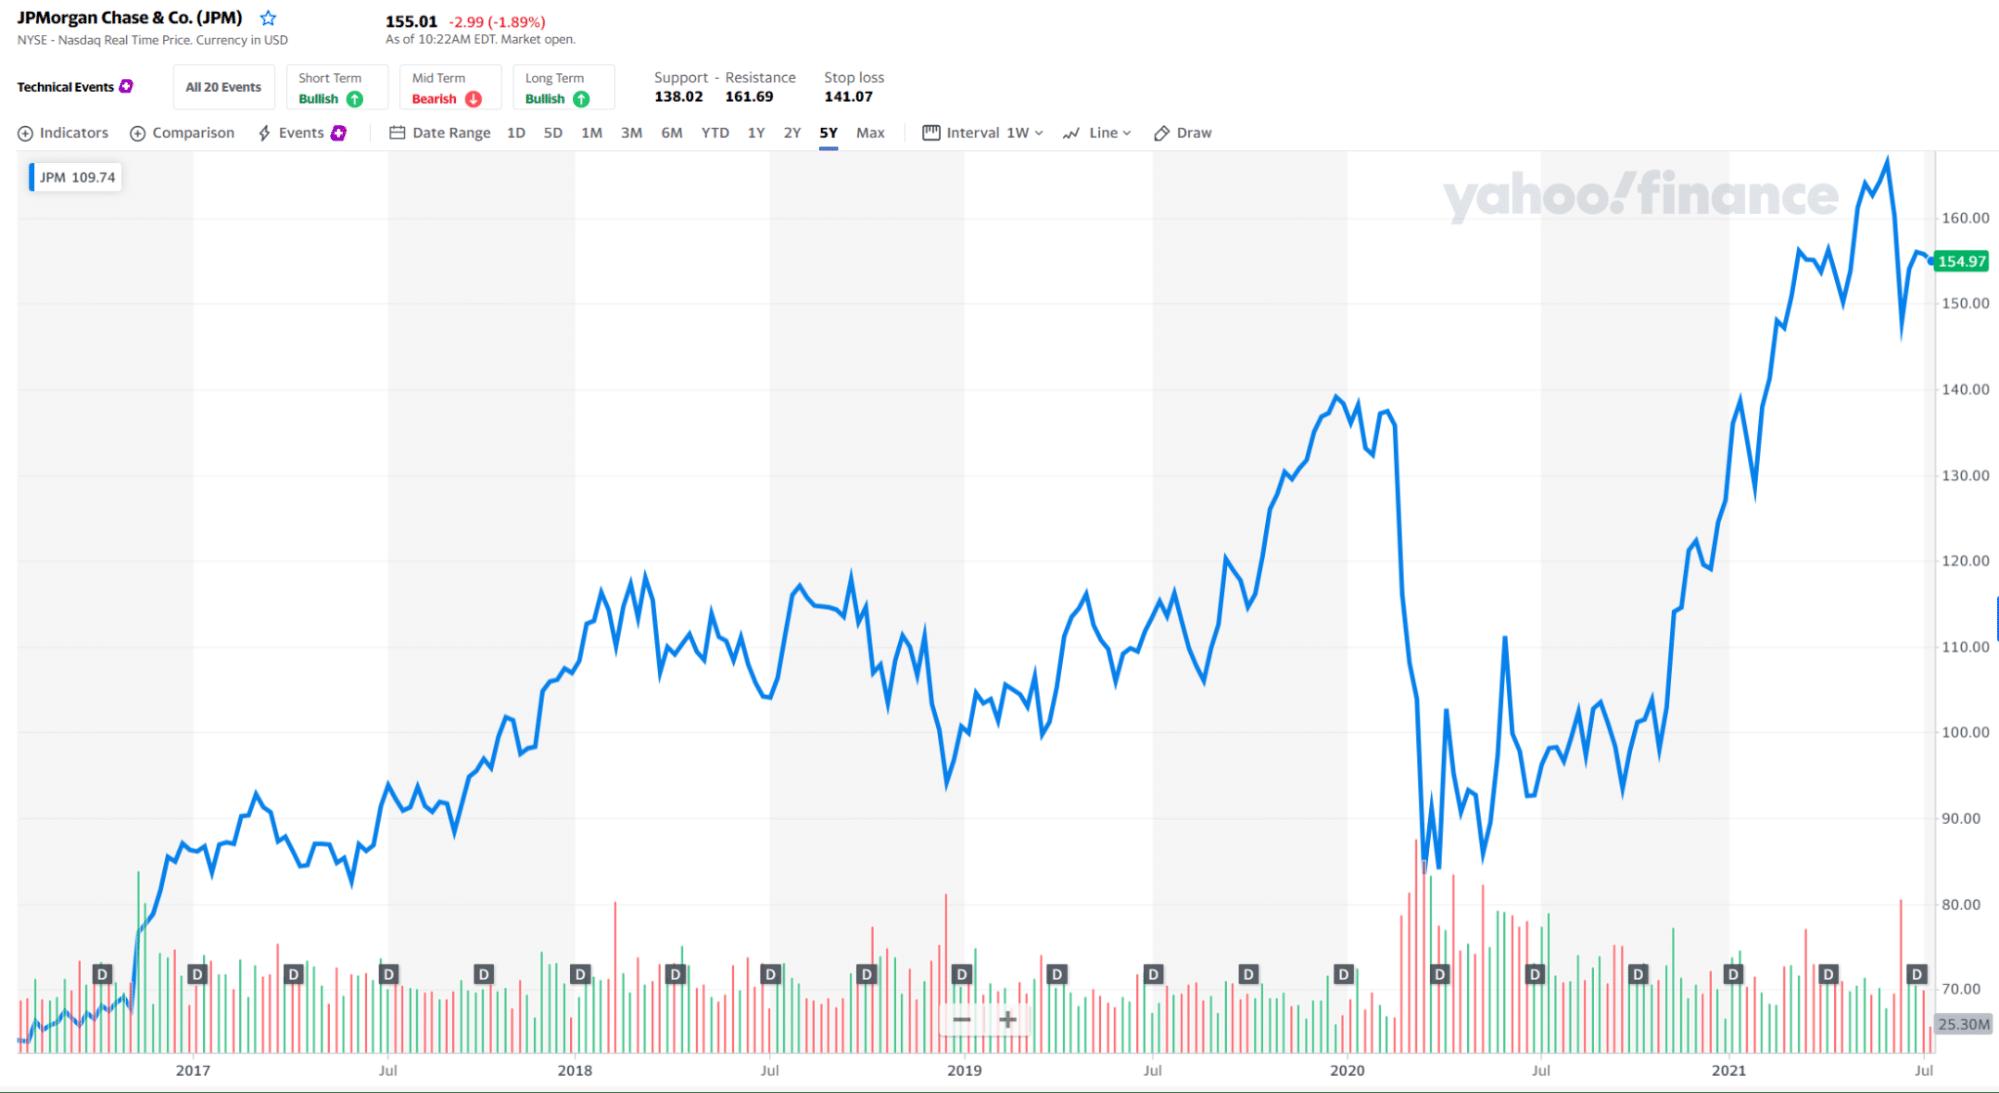 JPMorgan Chase&Co